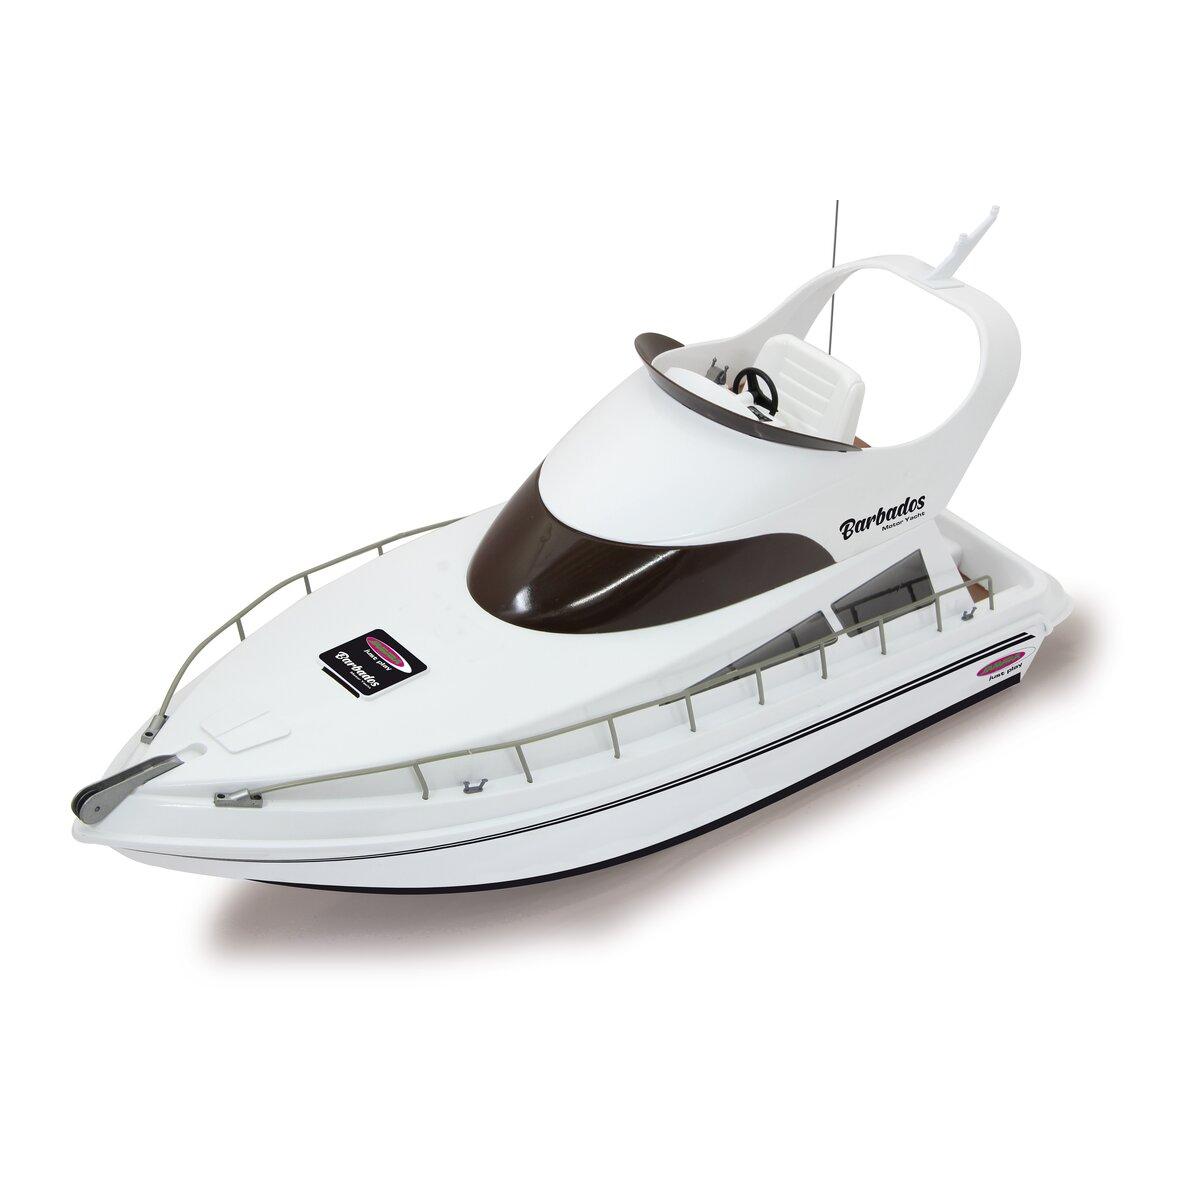 Jamara Barbados RC-Yacht 2,4Ghz